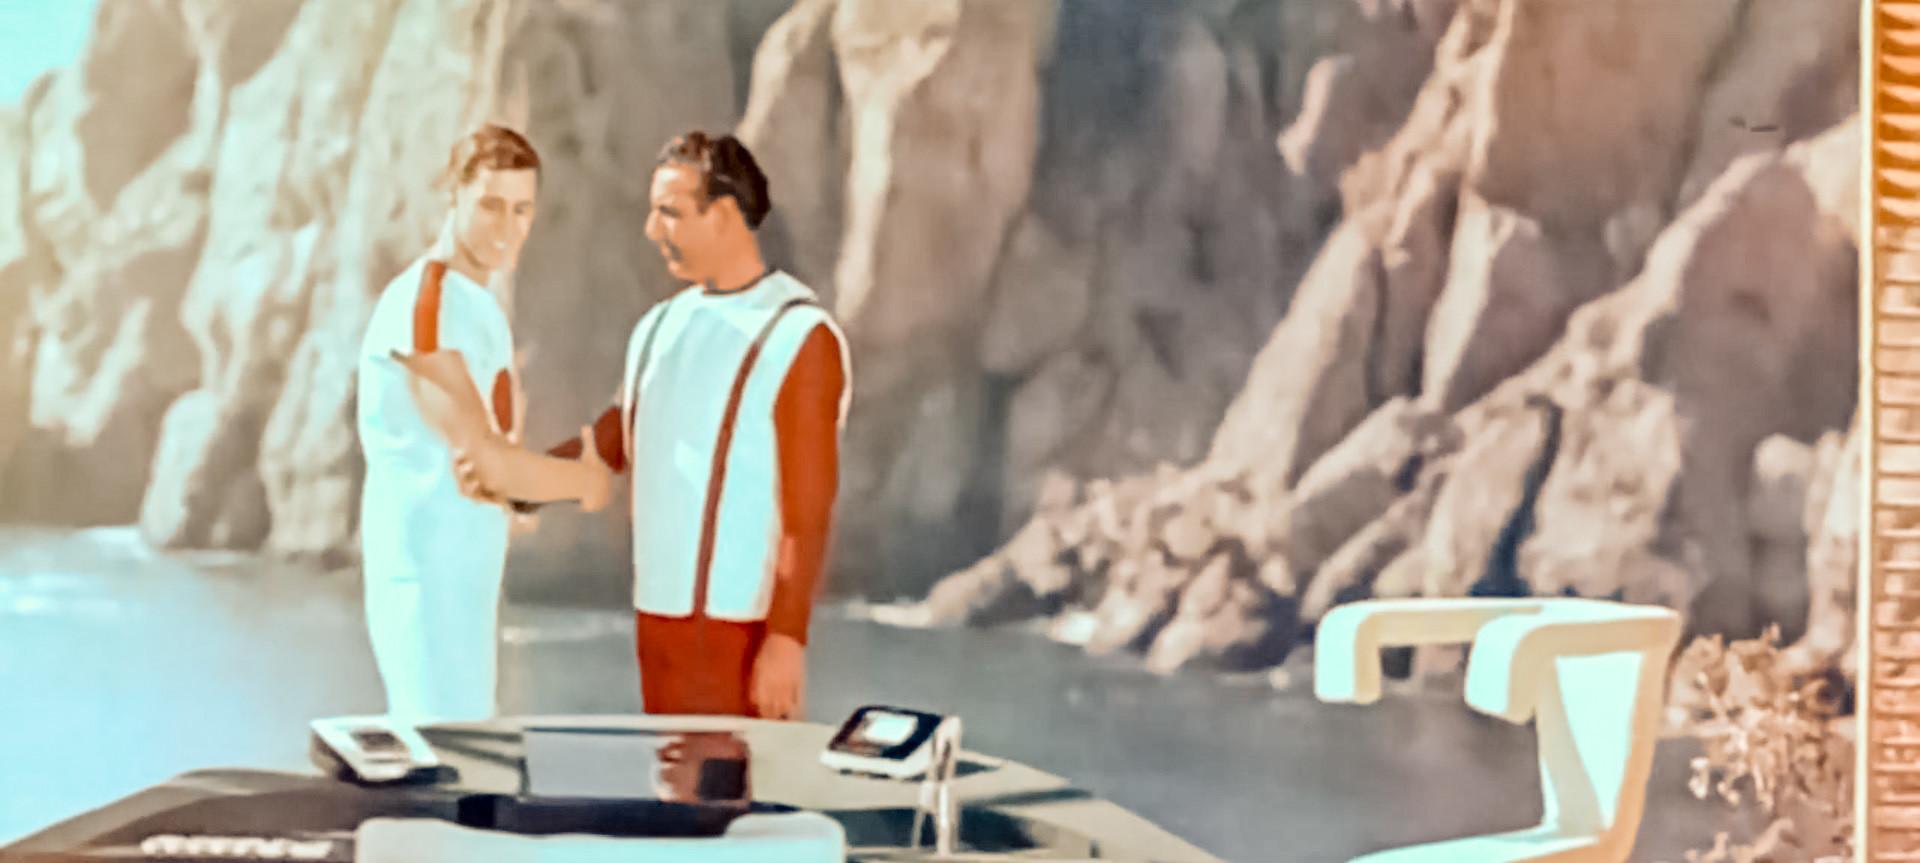 Andromedina meglica. Prizor iz filma.